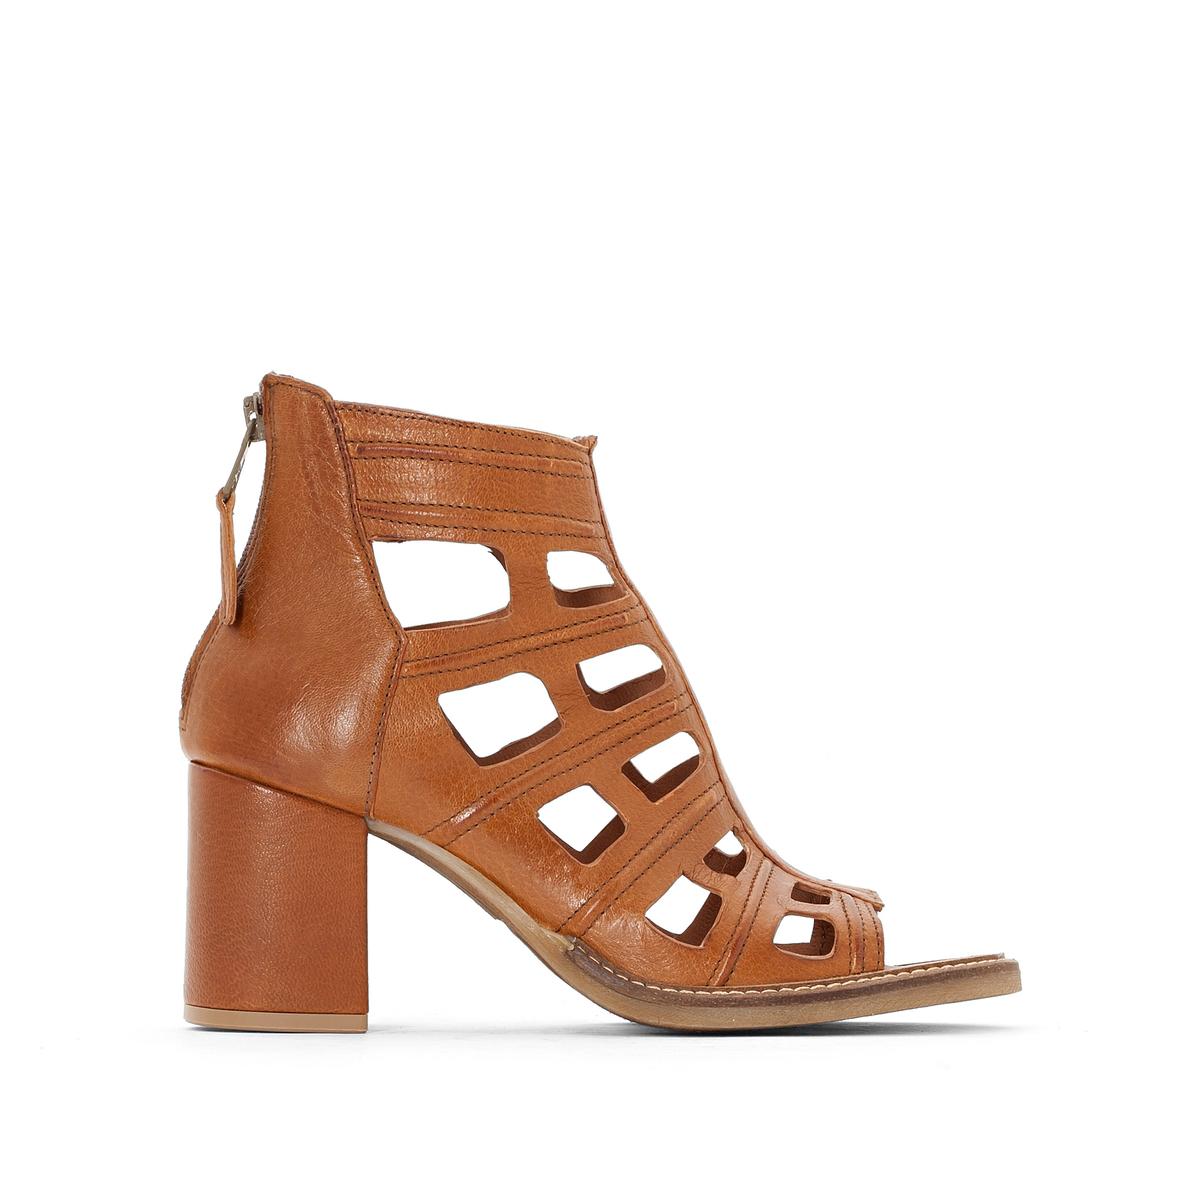 Босоножки на каблуке из ажурной кожи, Close melissa alexandre herchcovitch босоножки на каблуке